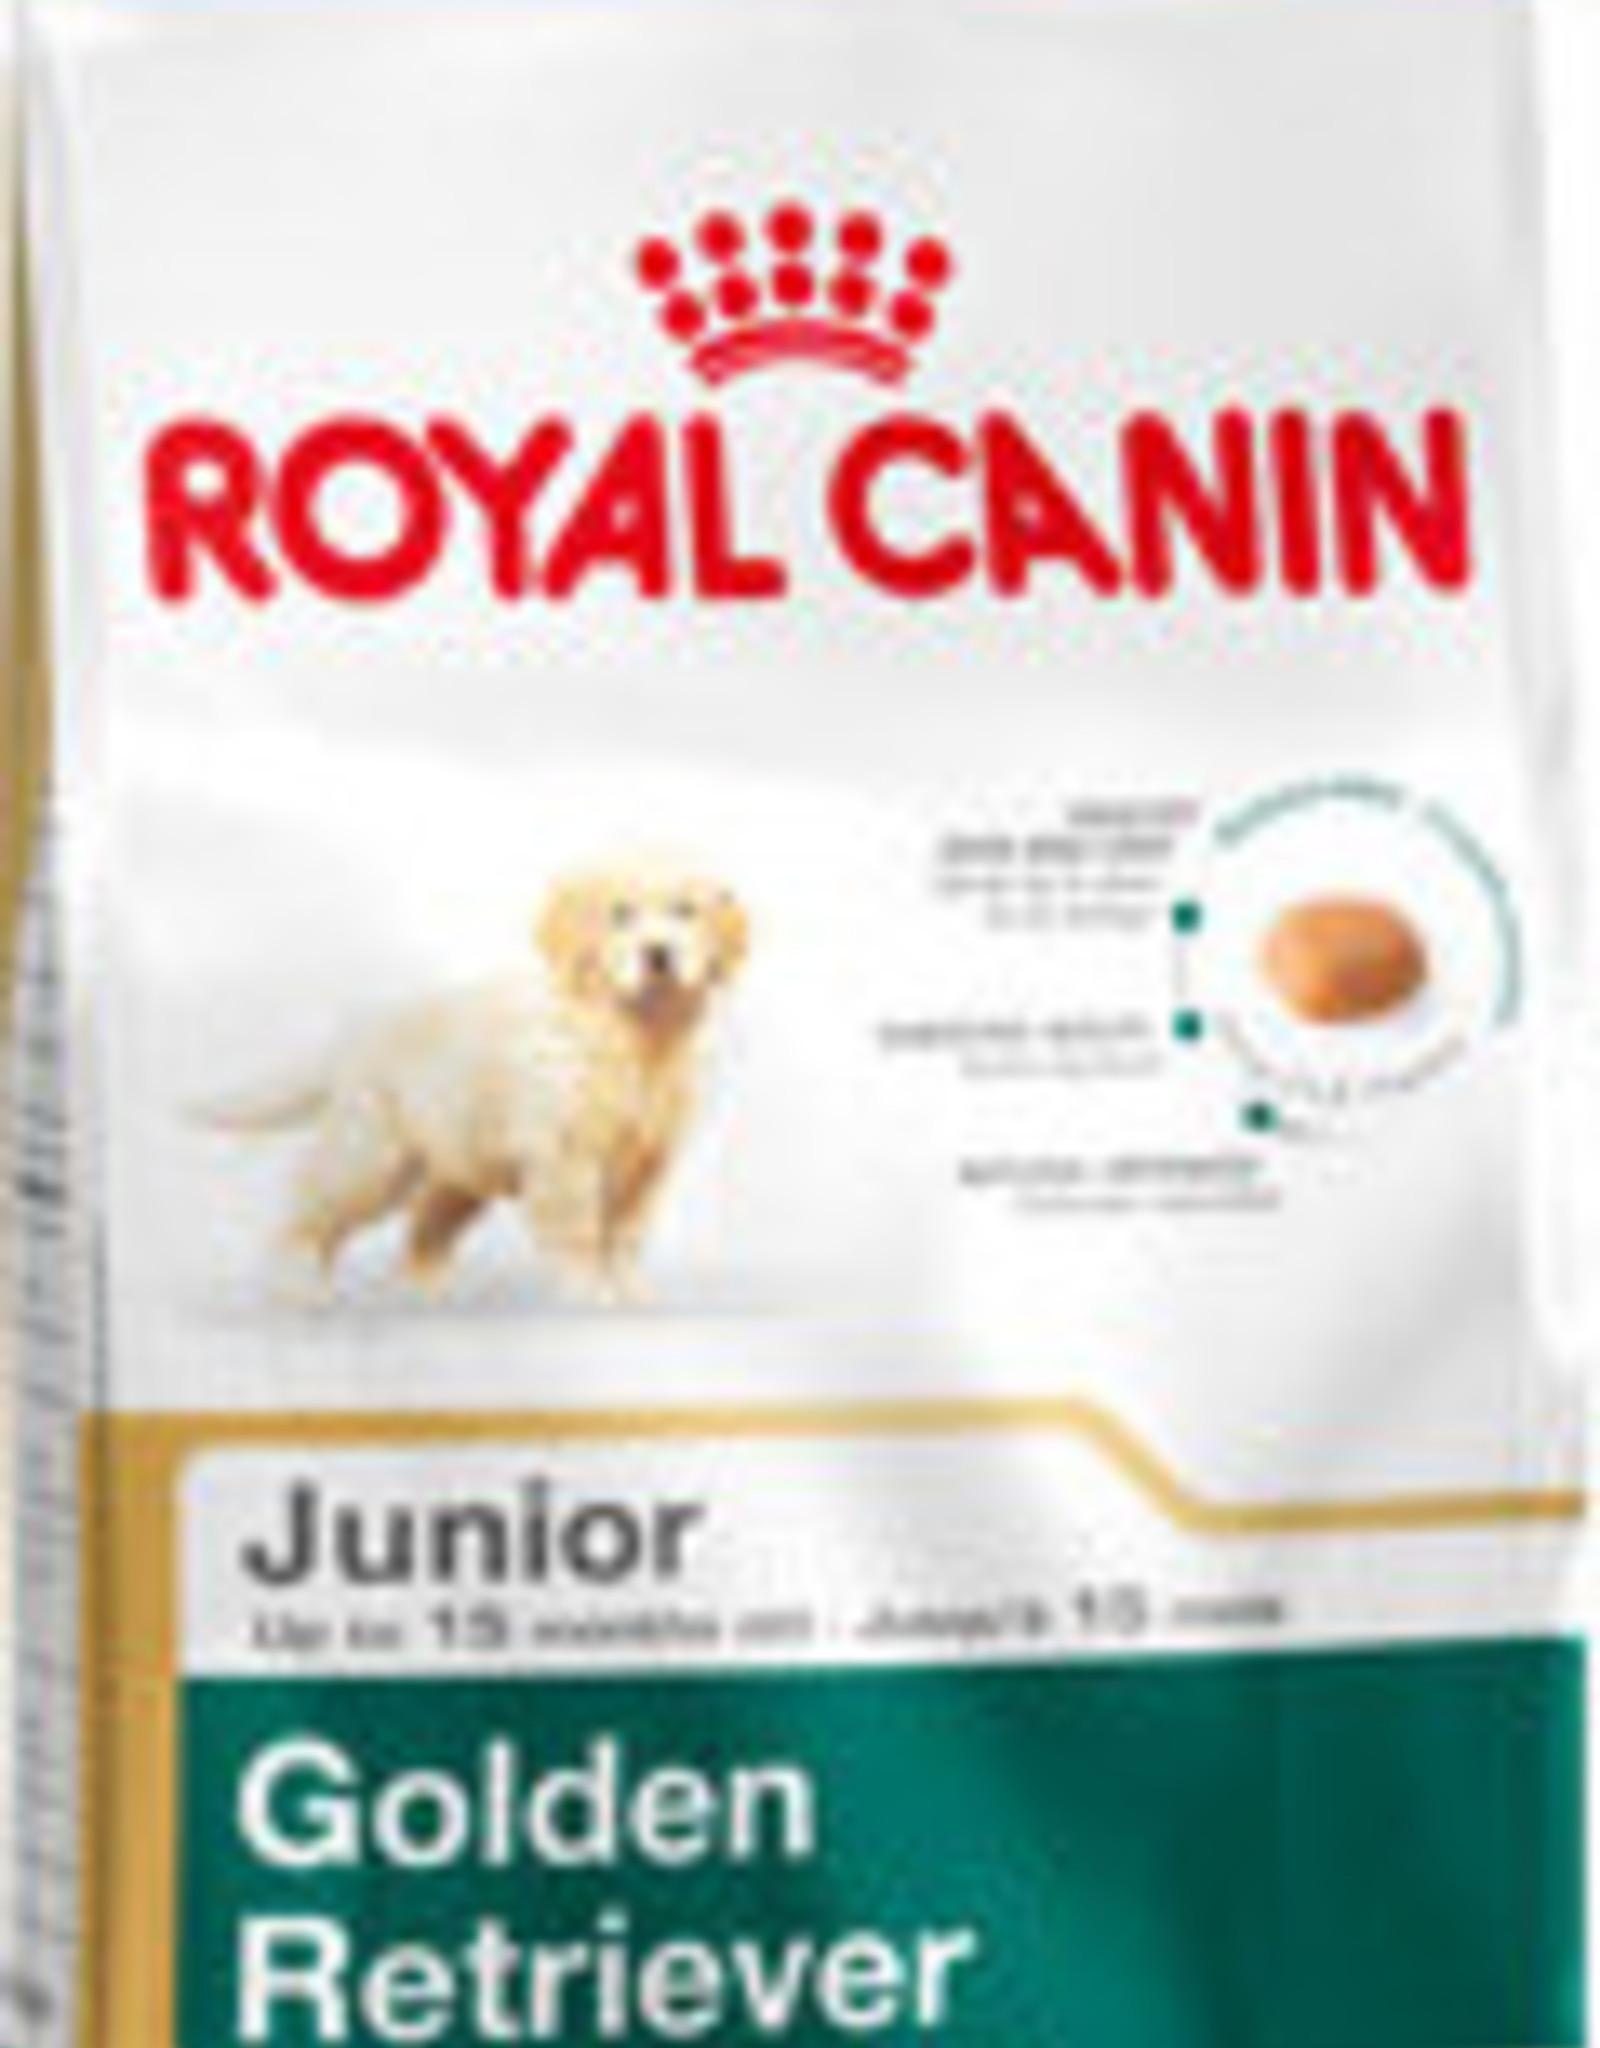 Royal Canin Royal Canin Bhn Golden Retriever Junior 12kg